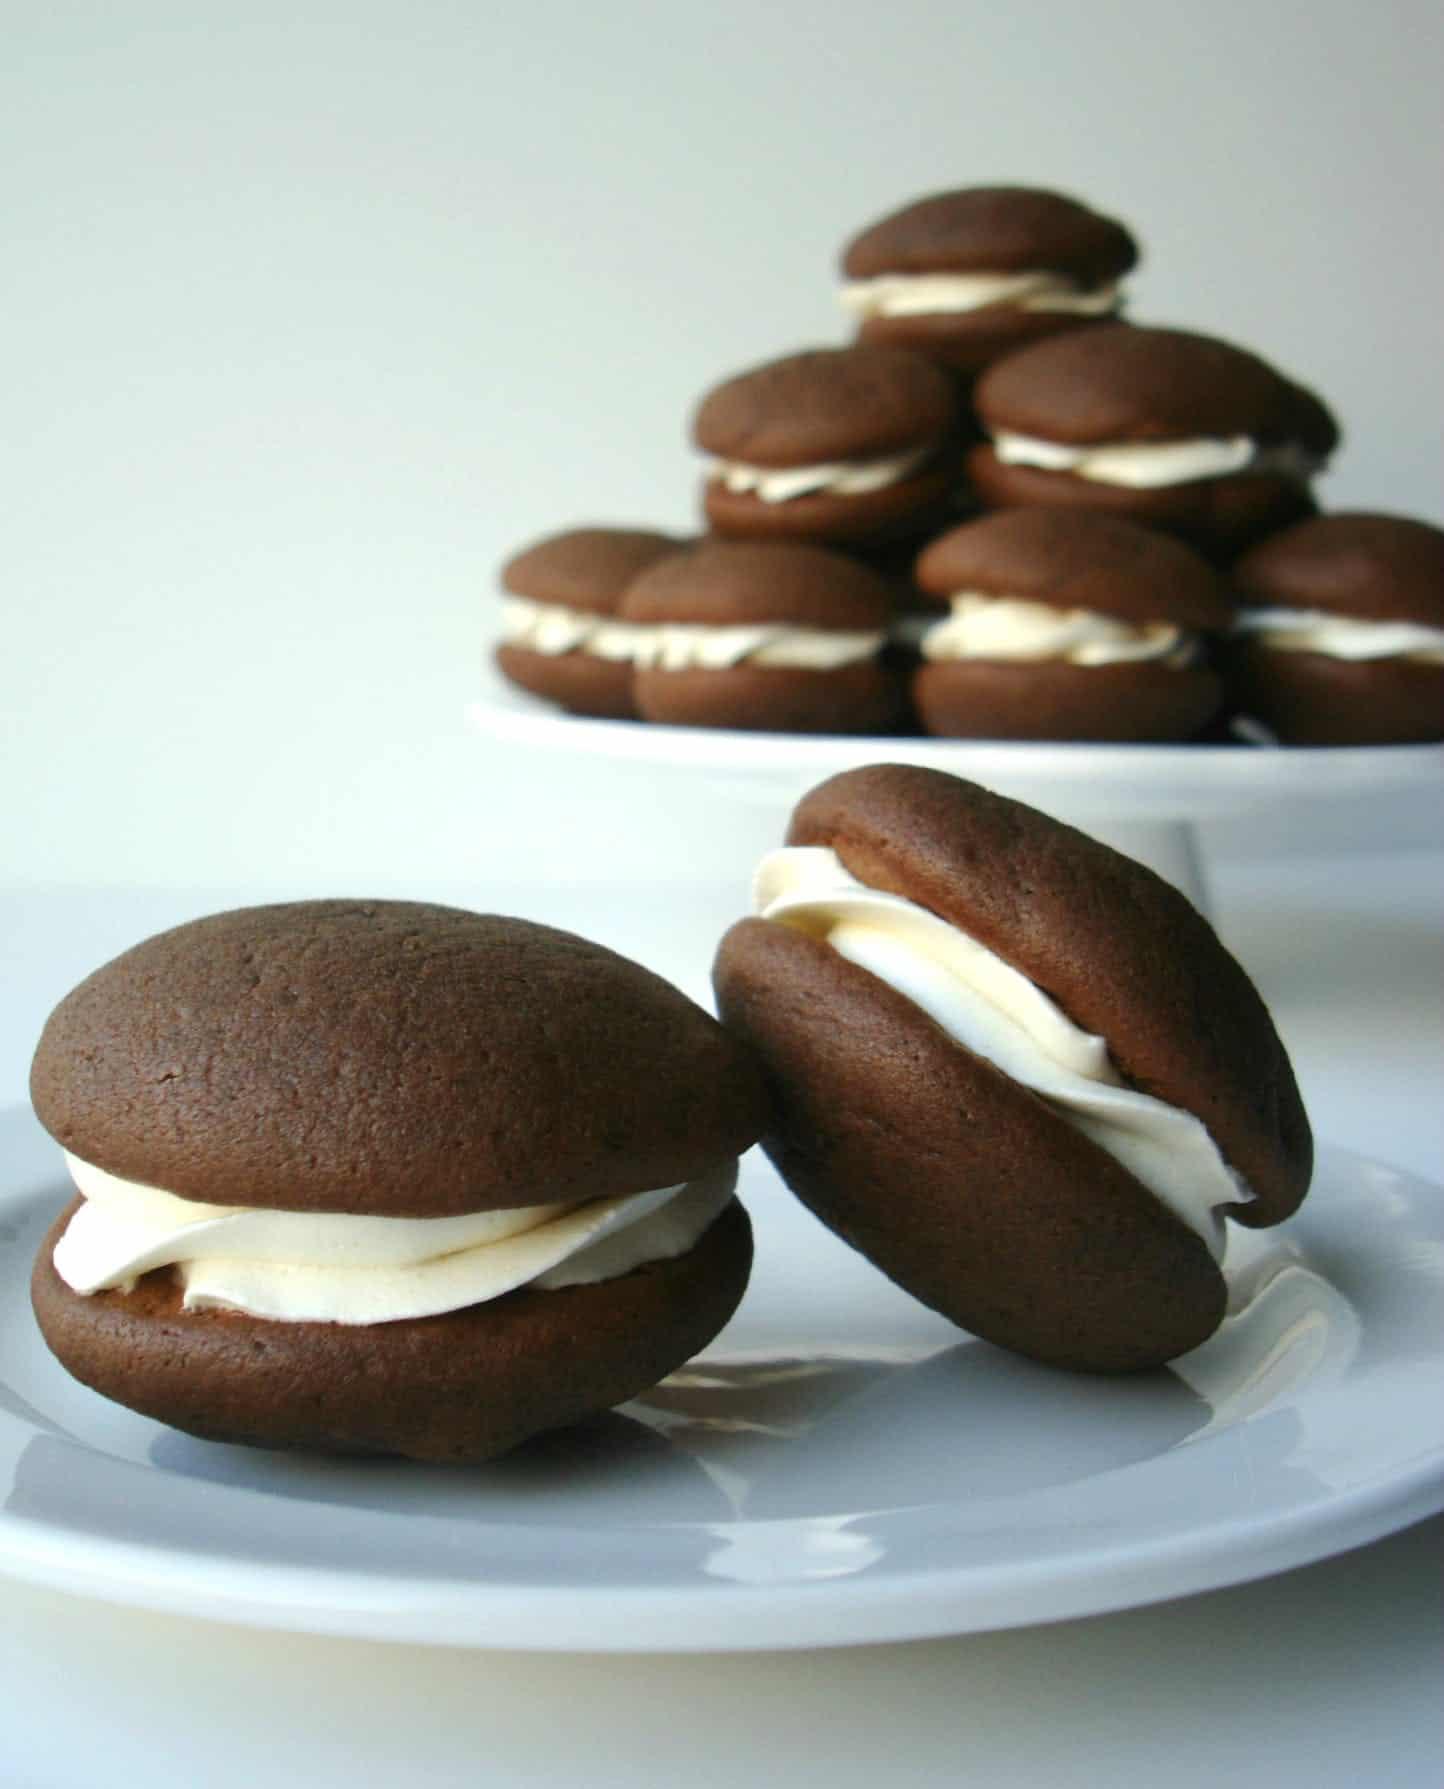 Chocolate buttercream whoopie pies